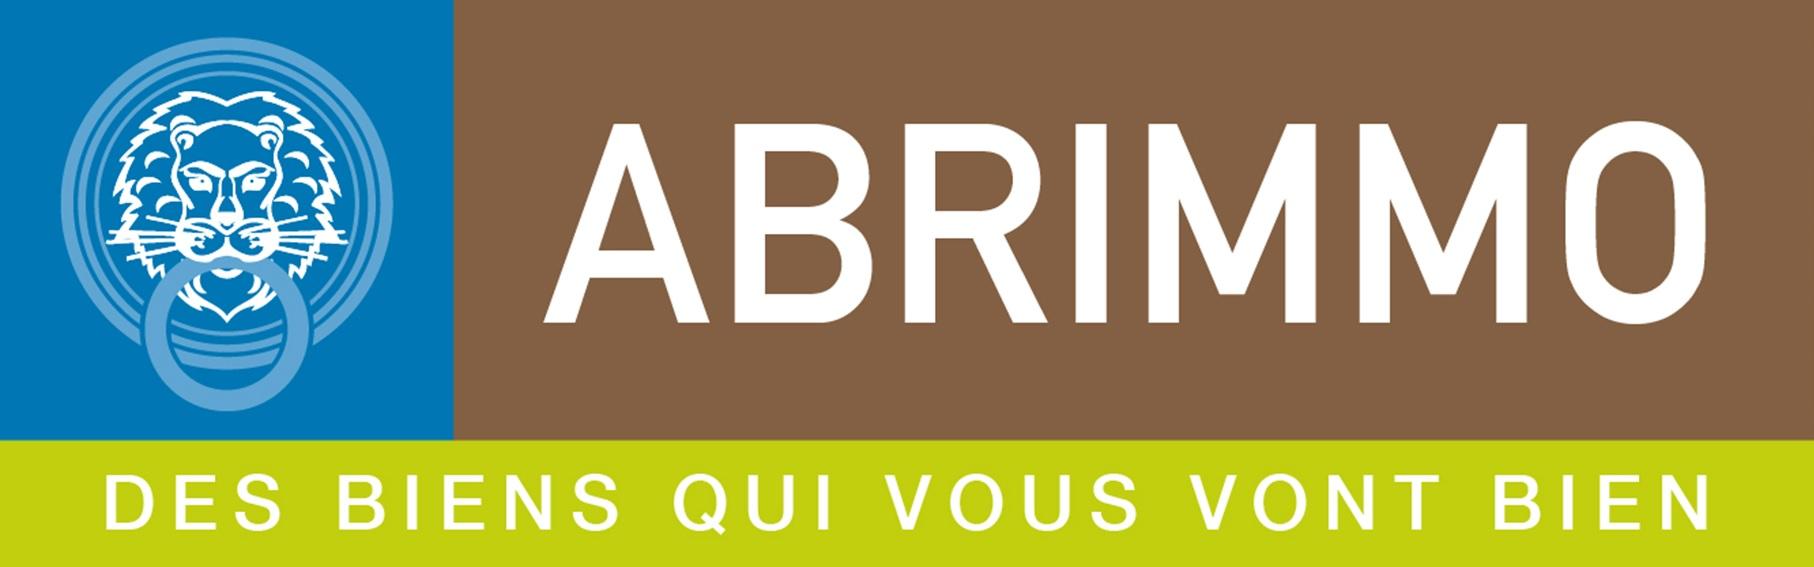 ABRIMMO LENS agence immobilière à LENS 62300